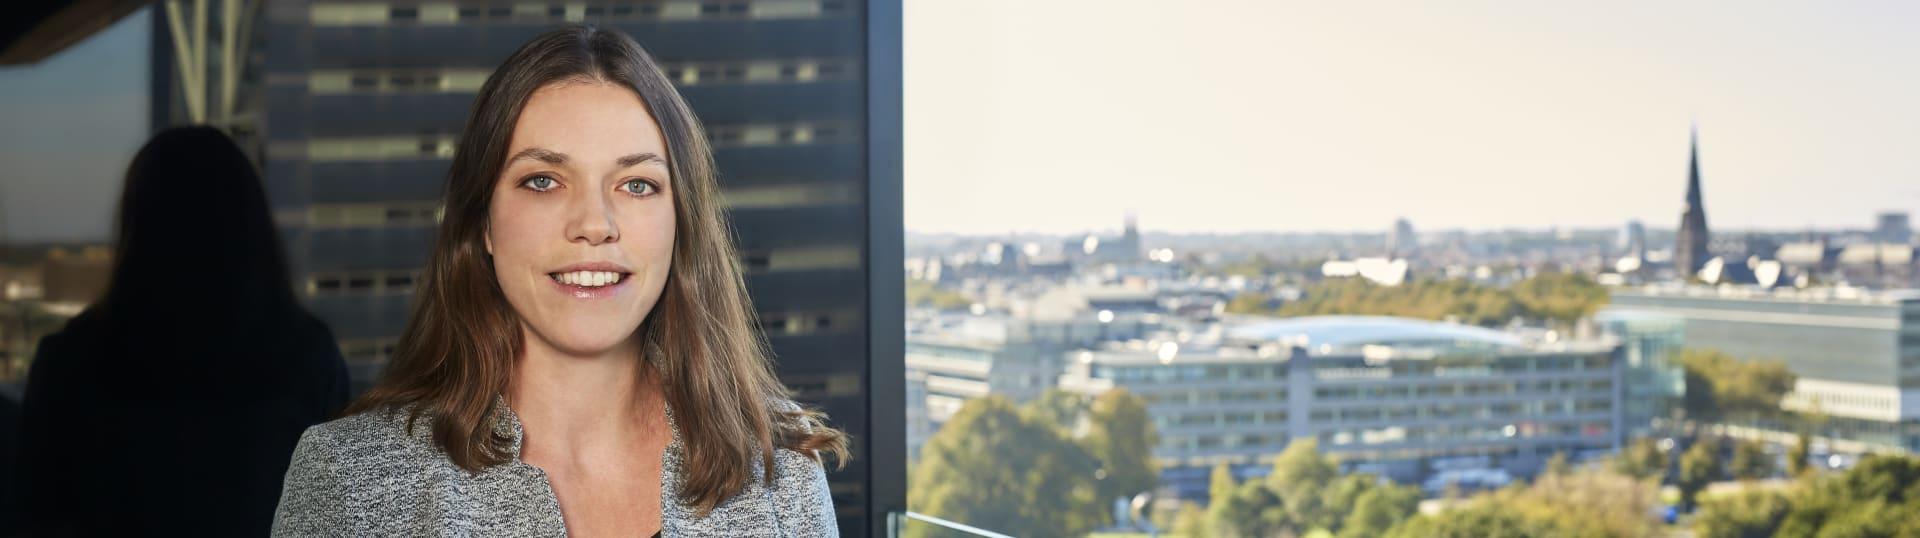 Martine Goudkade, kandidaat-notaris Pels Rijcken